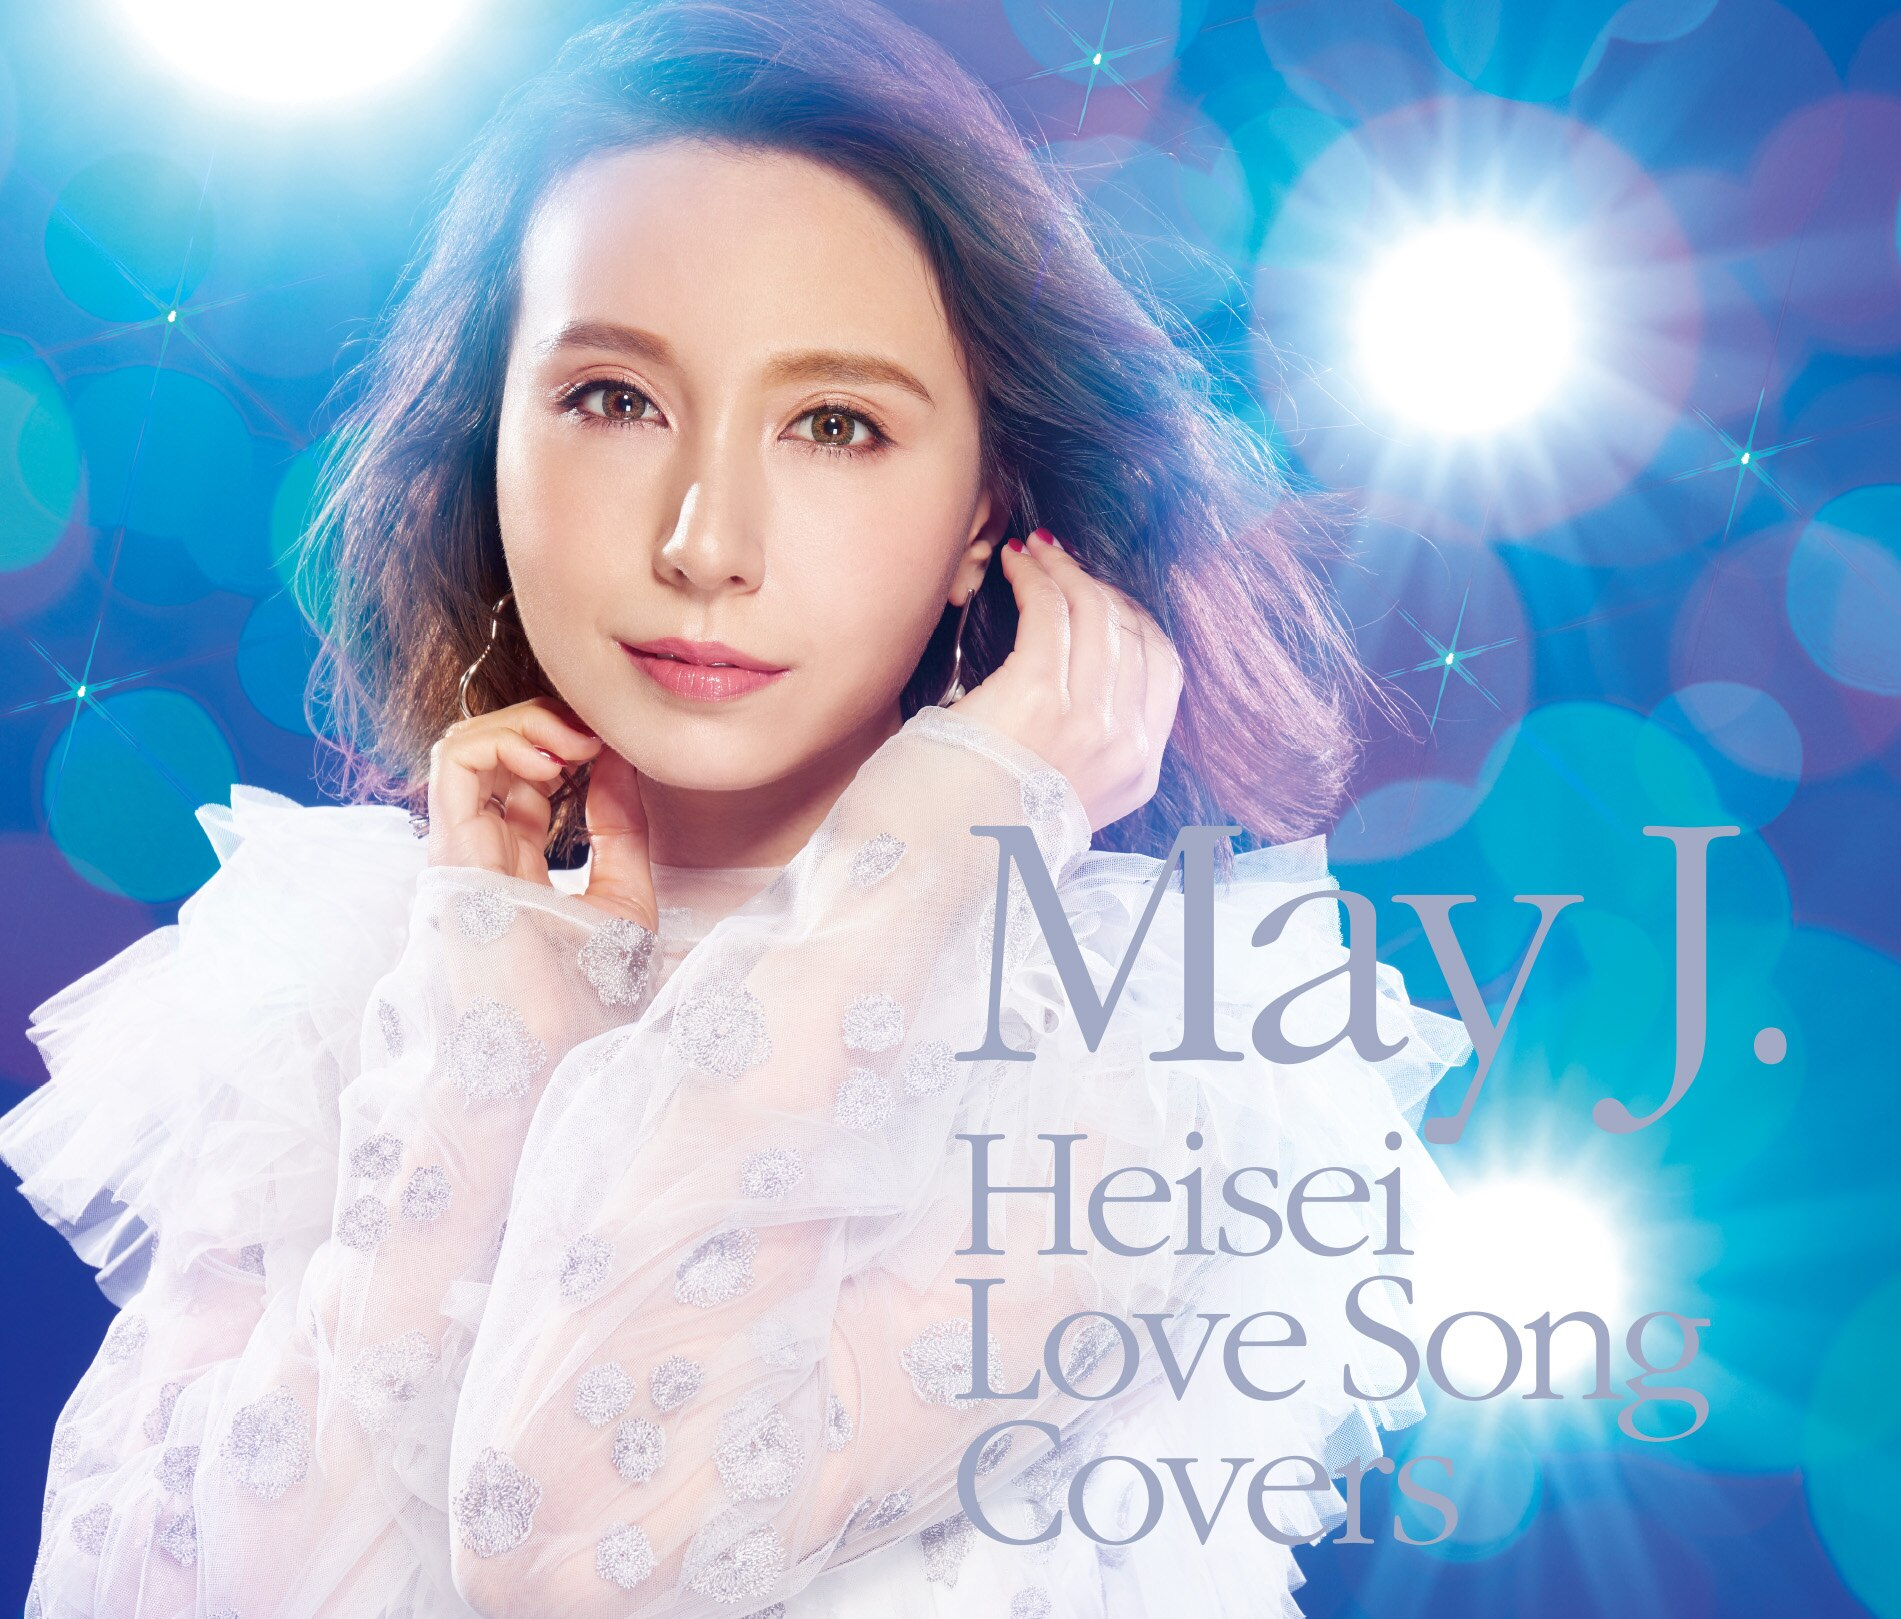 [2CD+DVD] 平成ラブソングカバーズ supported by DAM 2019-04-17 RZCD-86826~7/B ¥5,400(税込)